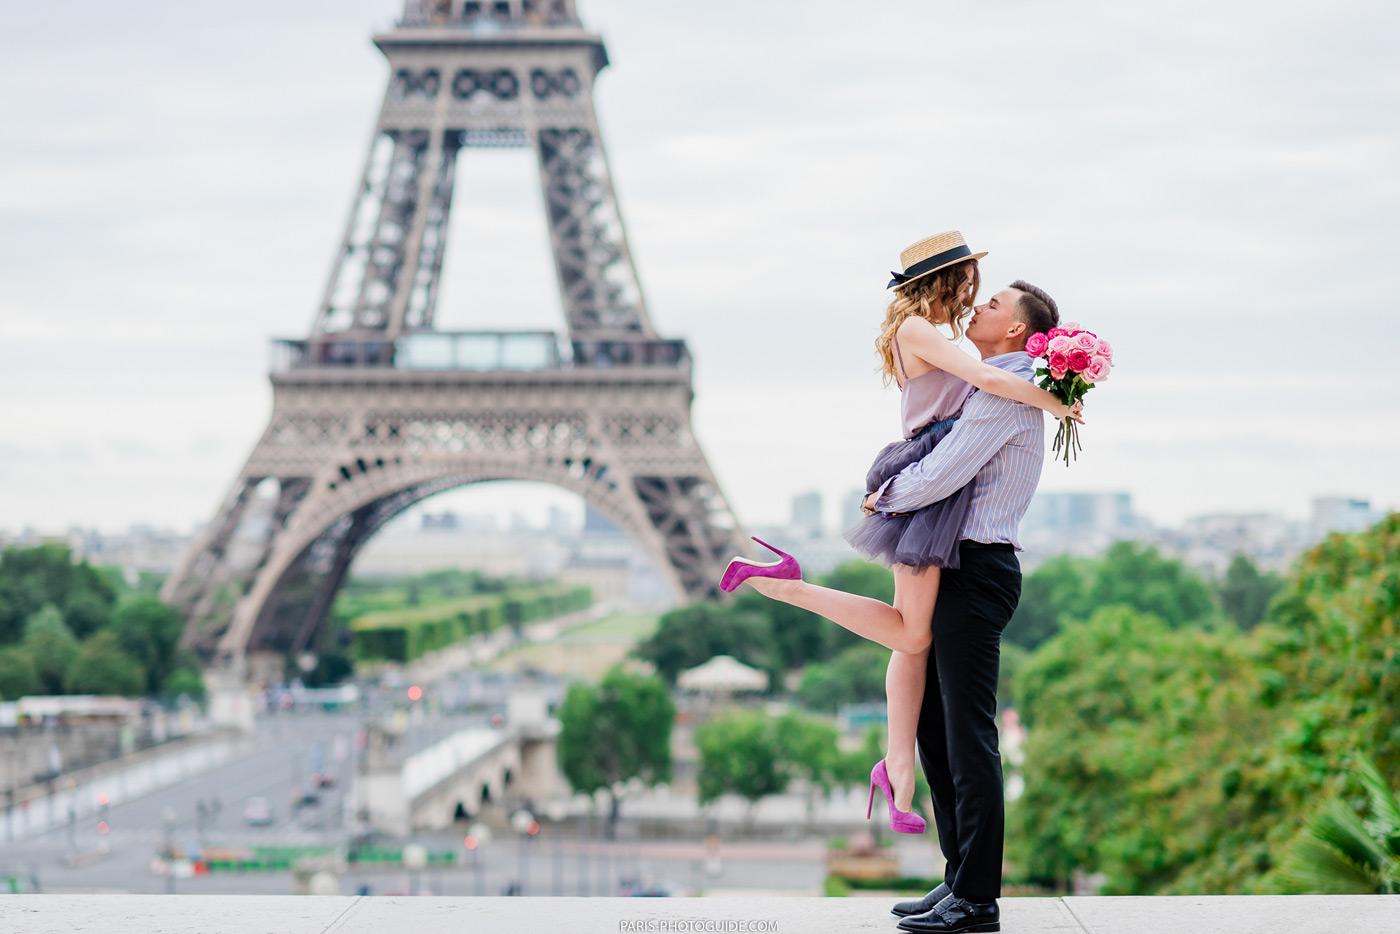 Романтическая прогулка по Парижу